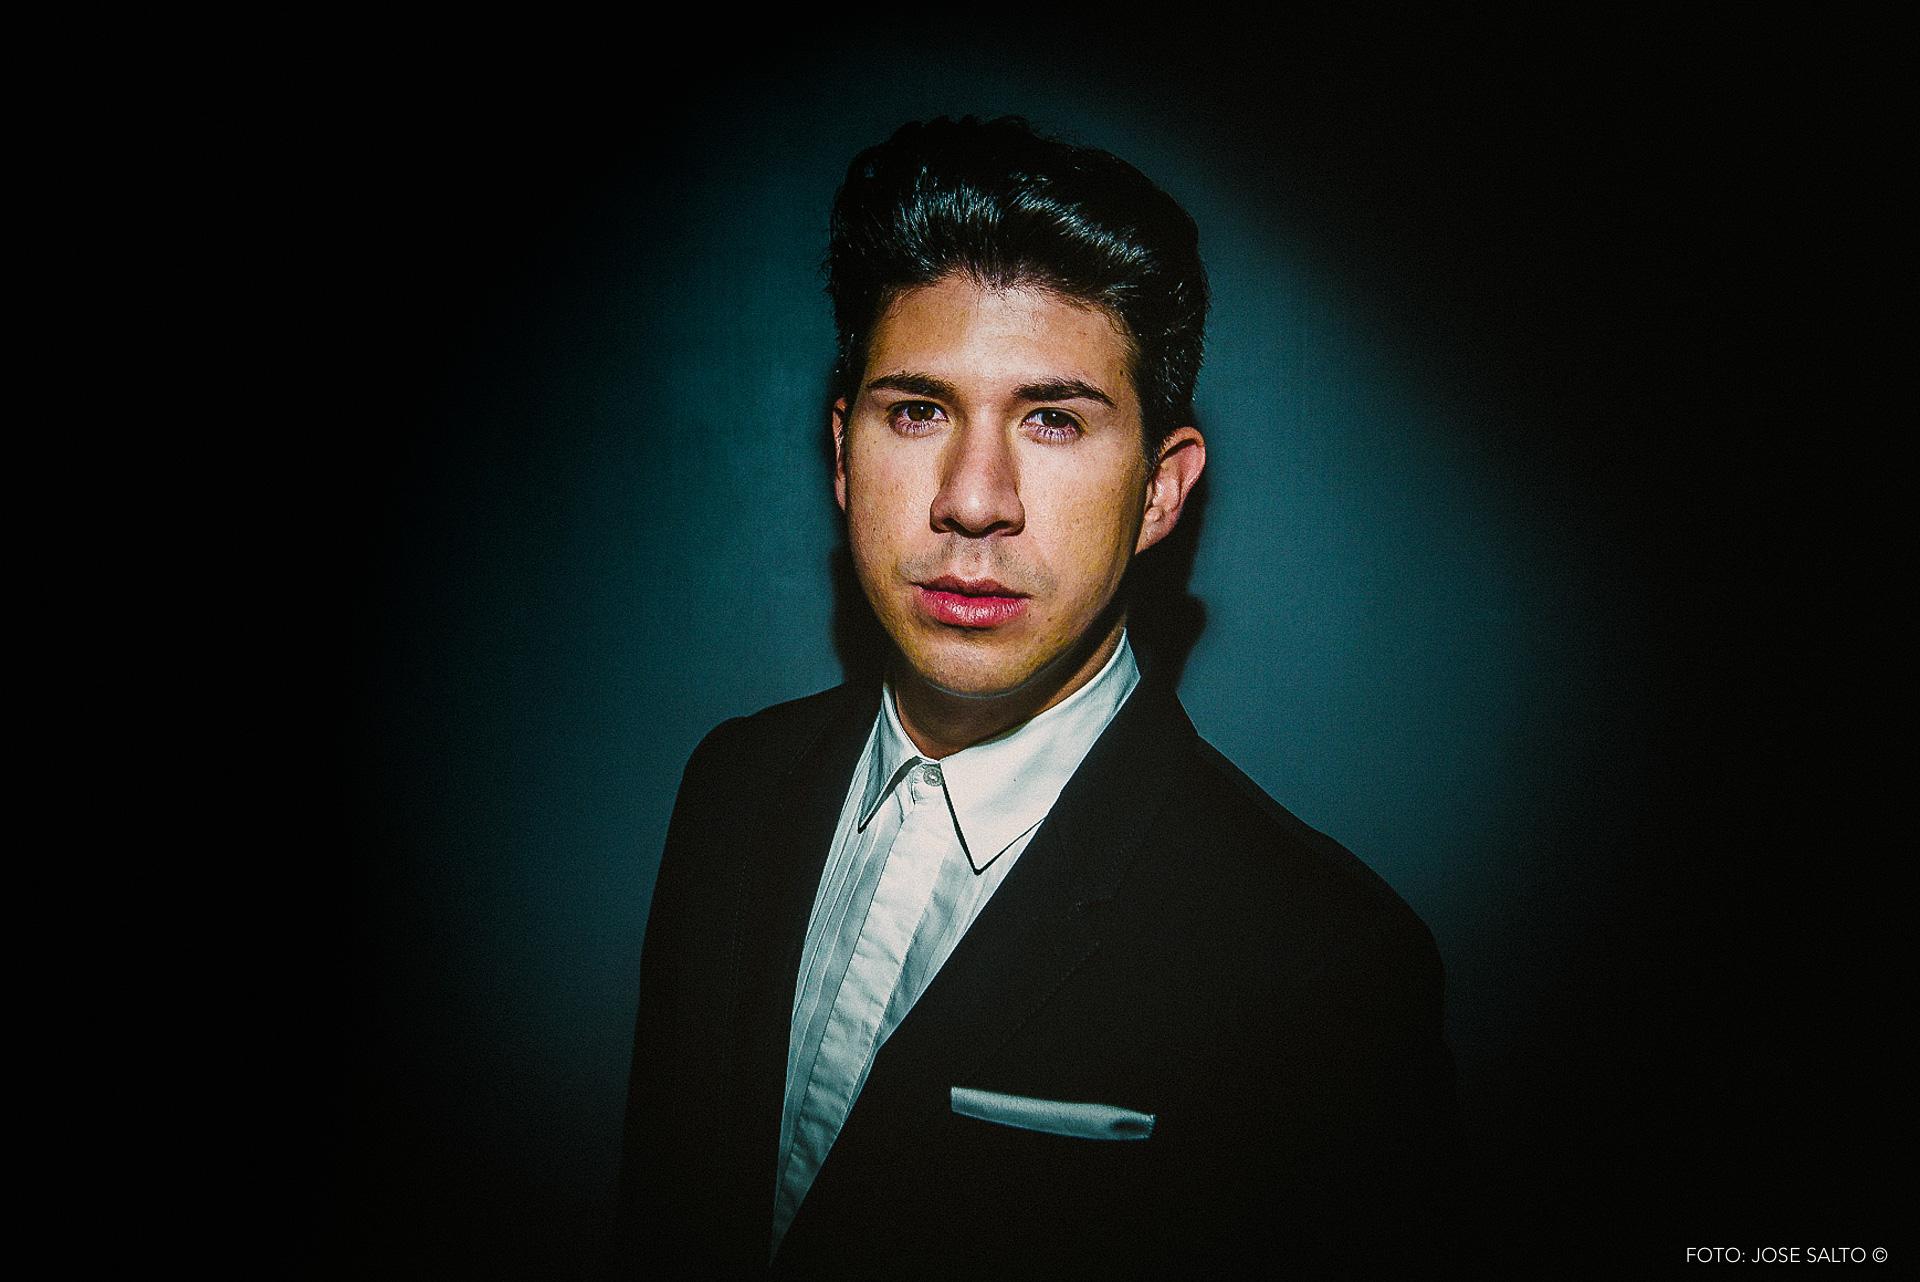 Fotografo profesional de retratos en Madrid, retrato fotografico moderno, jose salto